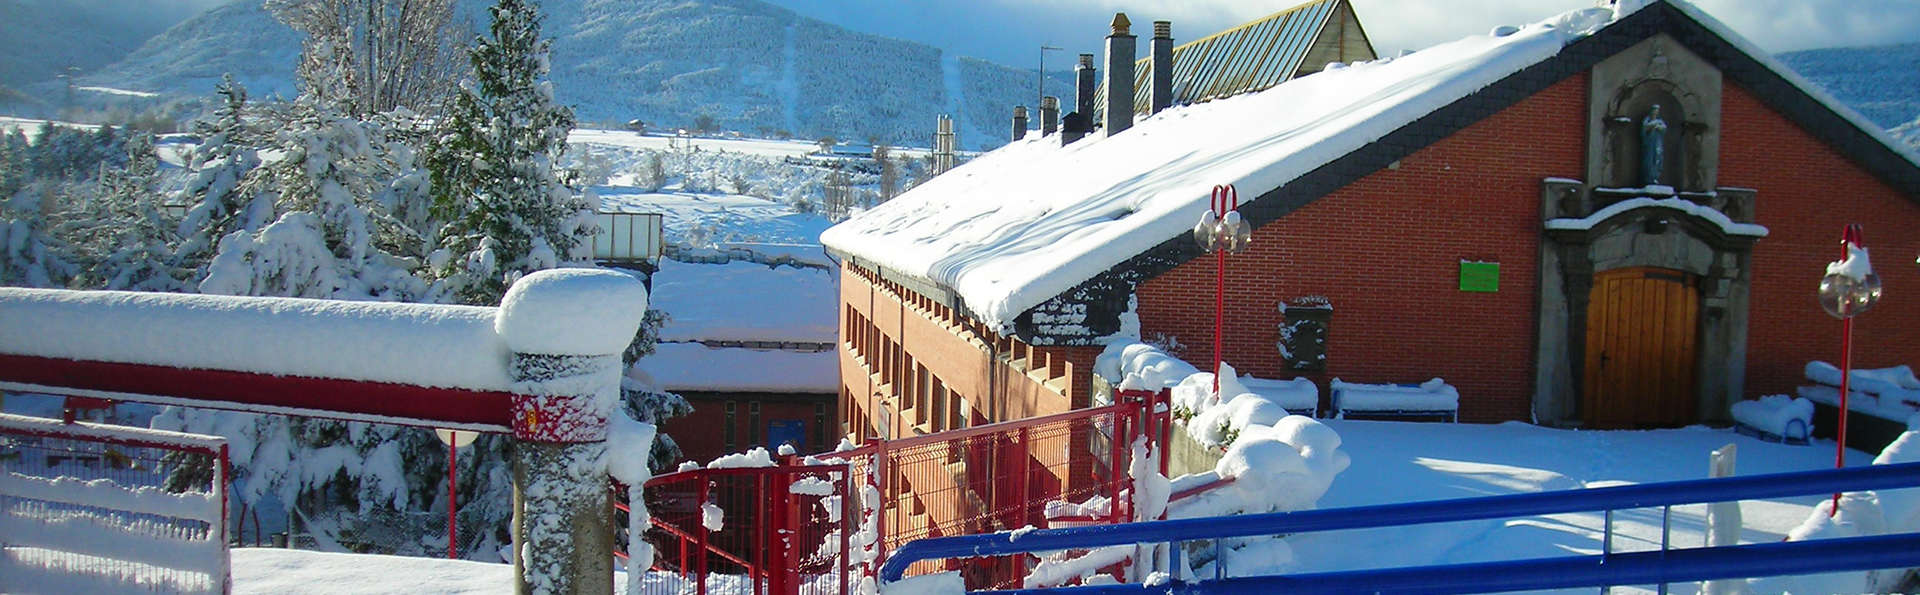 Albergue Jaca - edit_Albergue-nevado.jpg